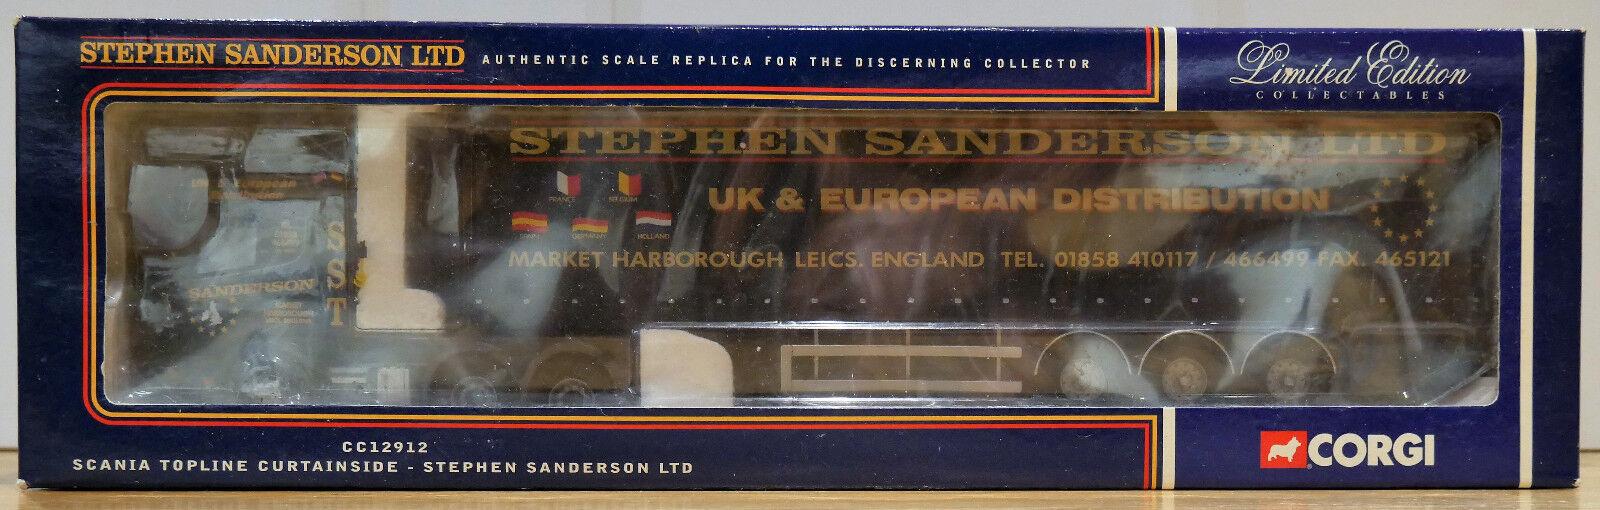 Corgi 1 50 CC12912 Scania Topline Curtainside Stephen Sanderson 2648  2900 MIB  coloris étonnants